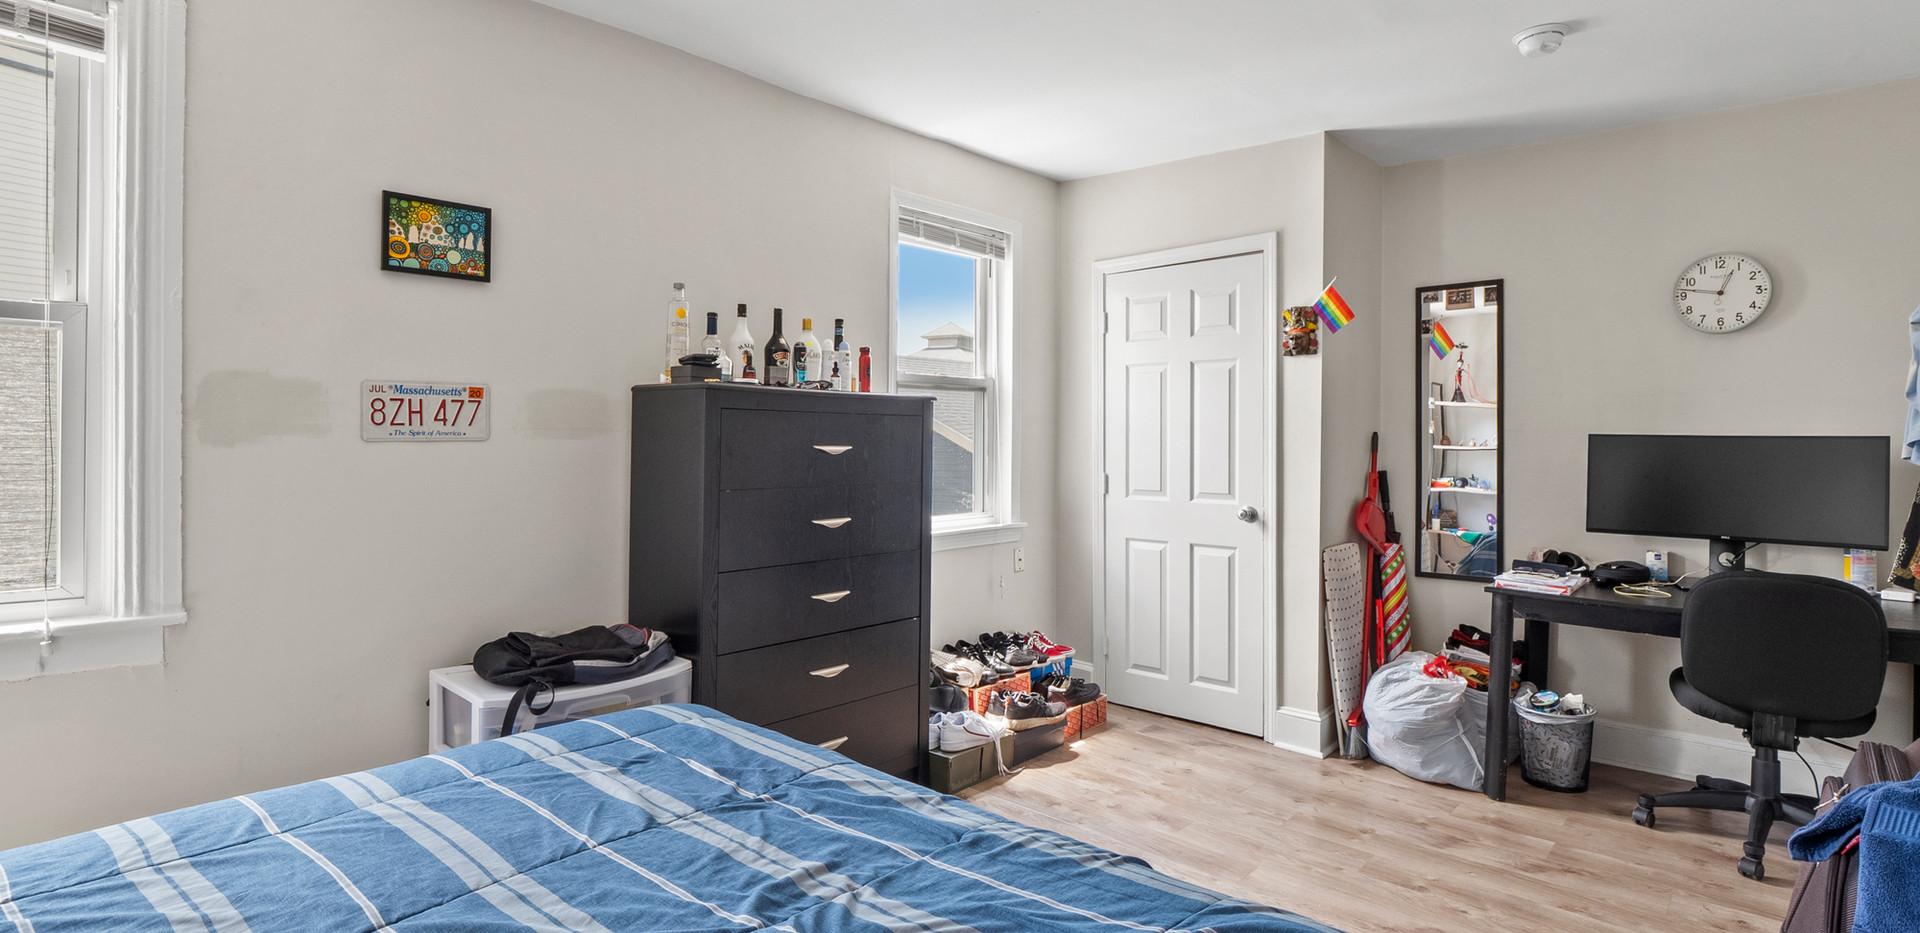 Bedroom B